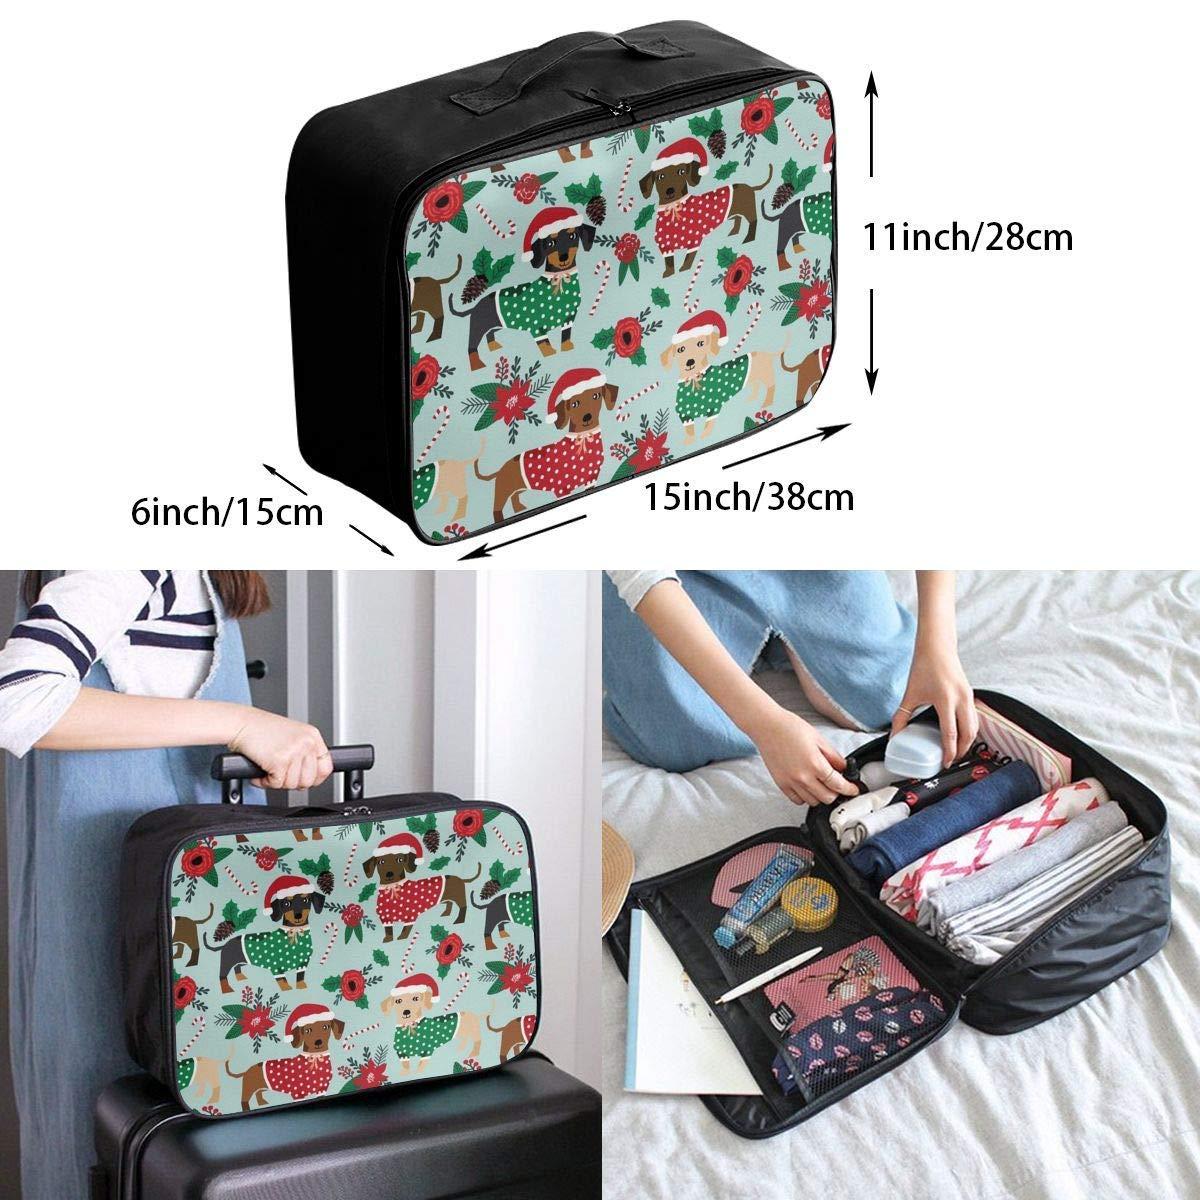 JTRVW Luggage Bags for Travel Travel Duffel Bag Waterproof Fashion Lightweight Large Capacity Portable Duffel Bag for Men /& Women Christmas Sweaters Cute Dachshunds